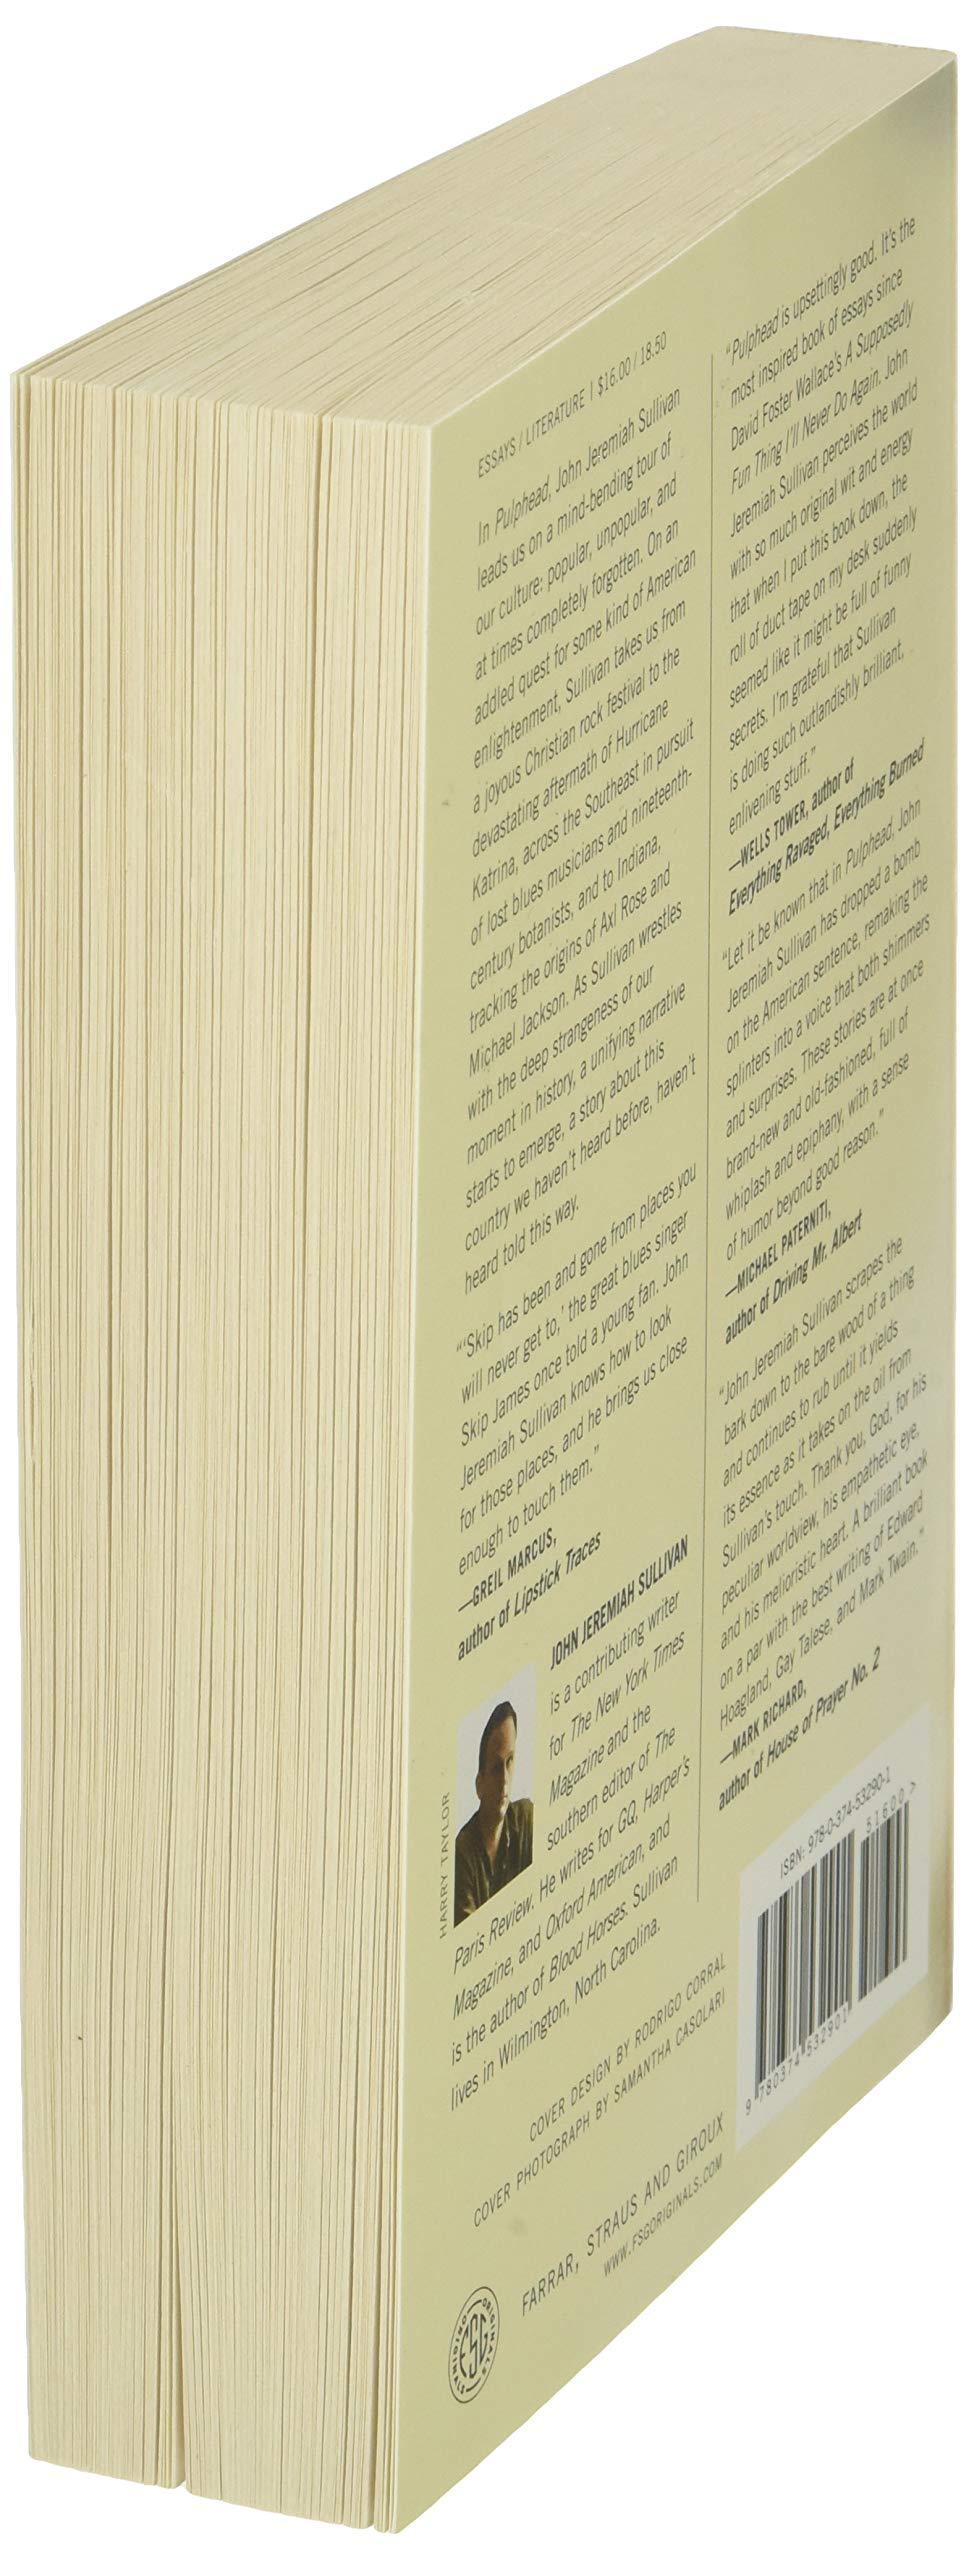 PULPHEAD: Amazon.es: Sullivan, John Jeremiah: Libros en ...